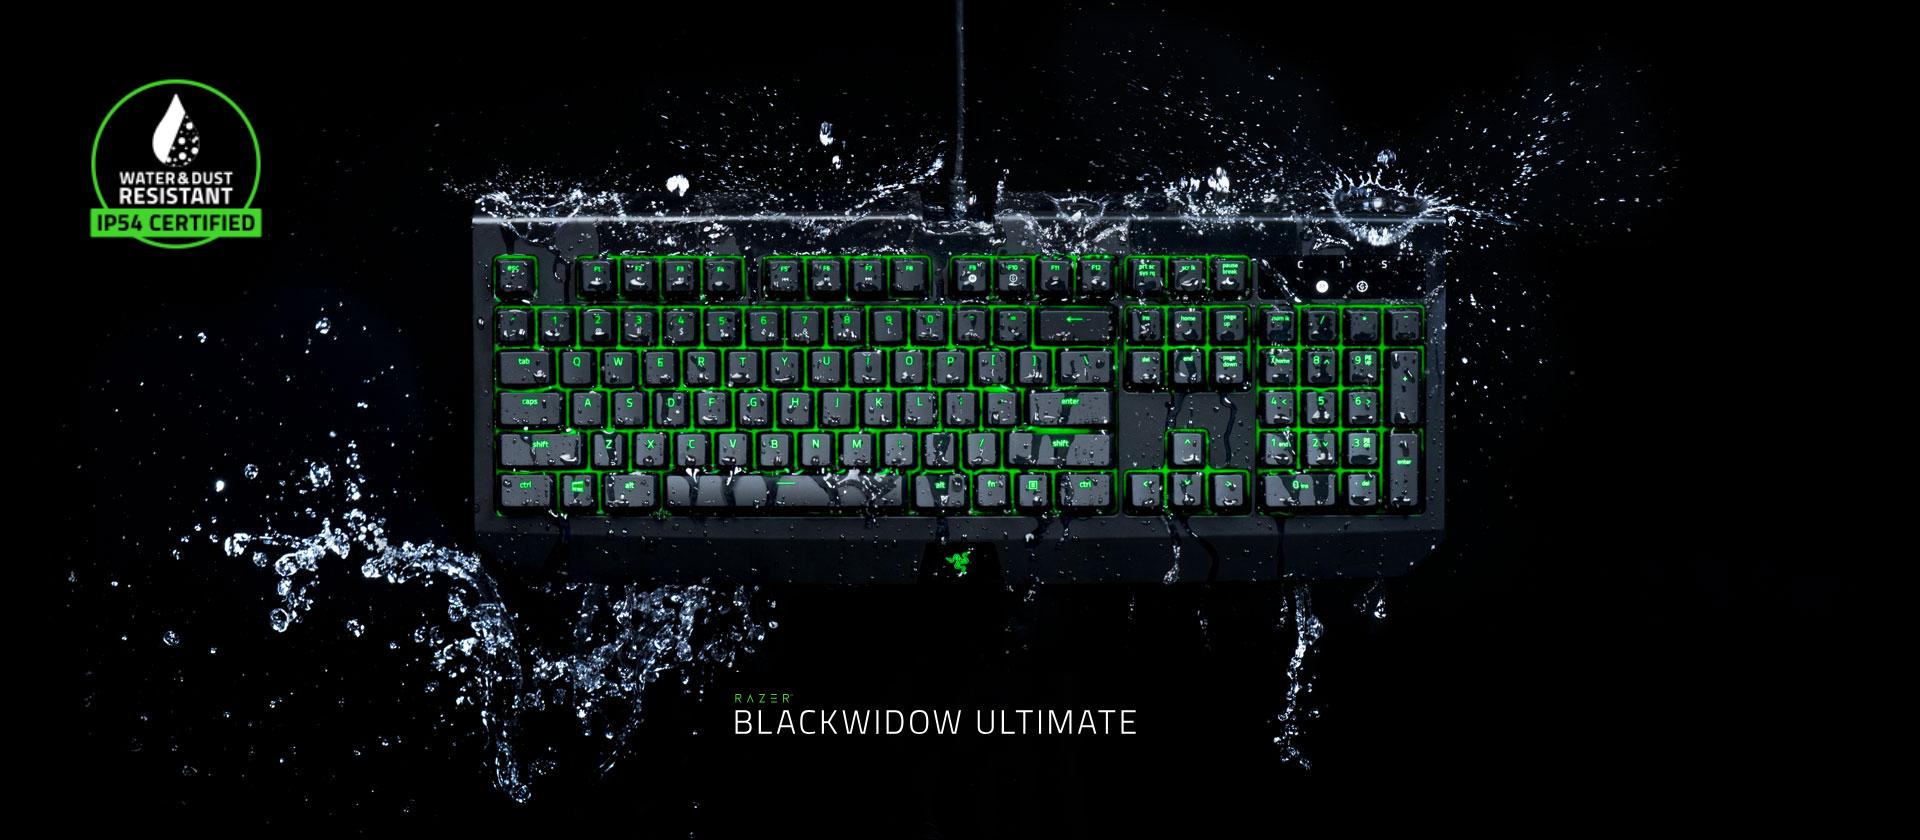 Razer BlackWidow Ultimate Gaming Keyboard - Green | Buy Online